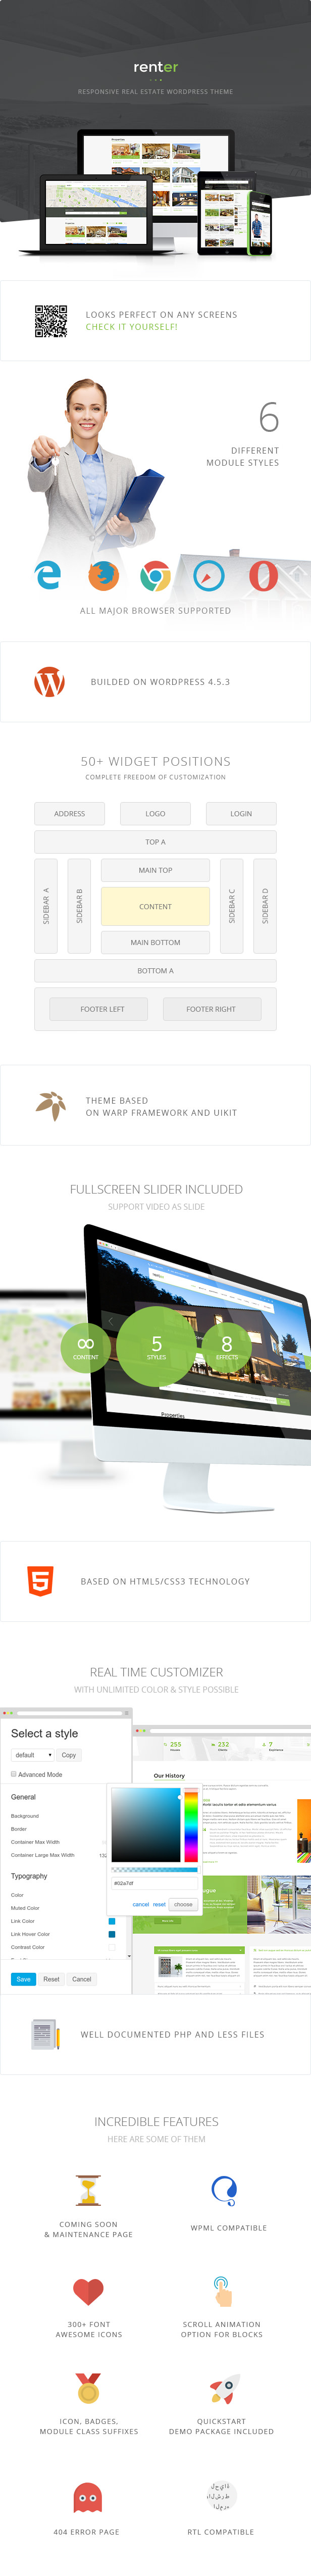 Mieter - Immobilien Miete / Verkauf Immobilienagentur & Makler Responsive WordPress Theme - 3